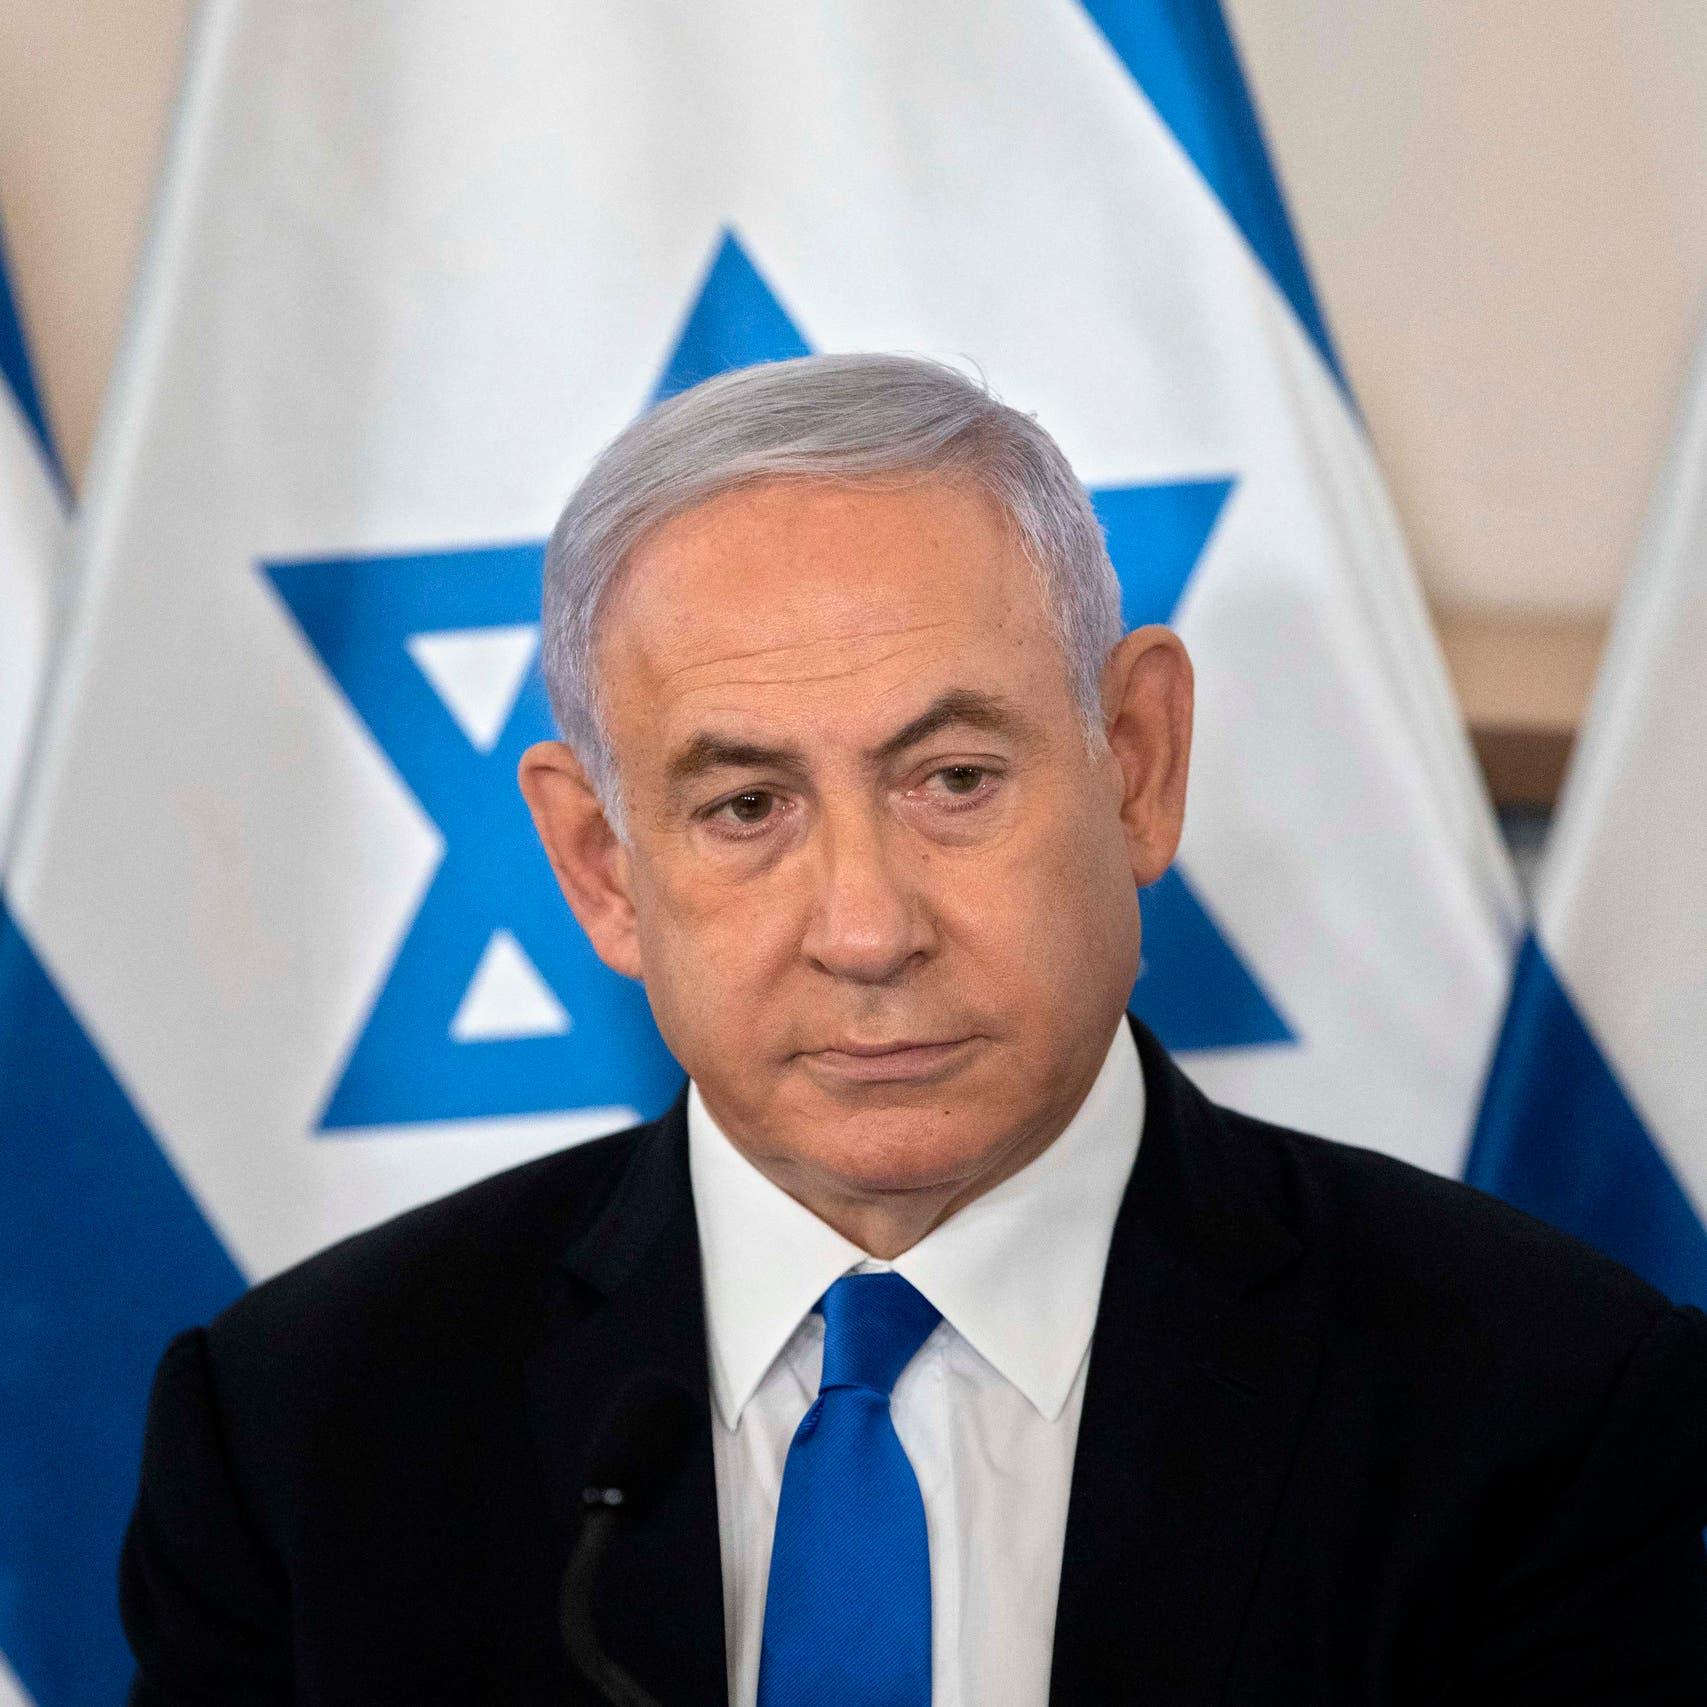 نتنياهو: سنتحرك ضد إيران حتى لو كلفنا تصعيداً مع أميركا